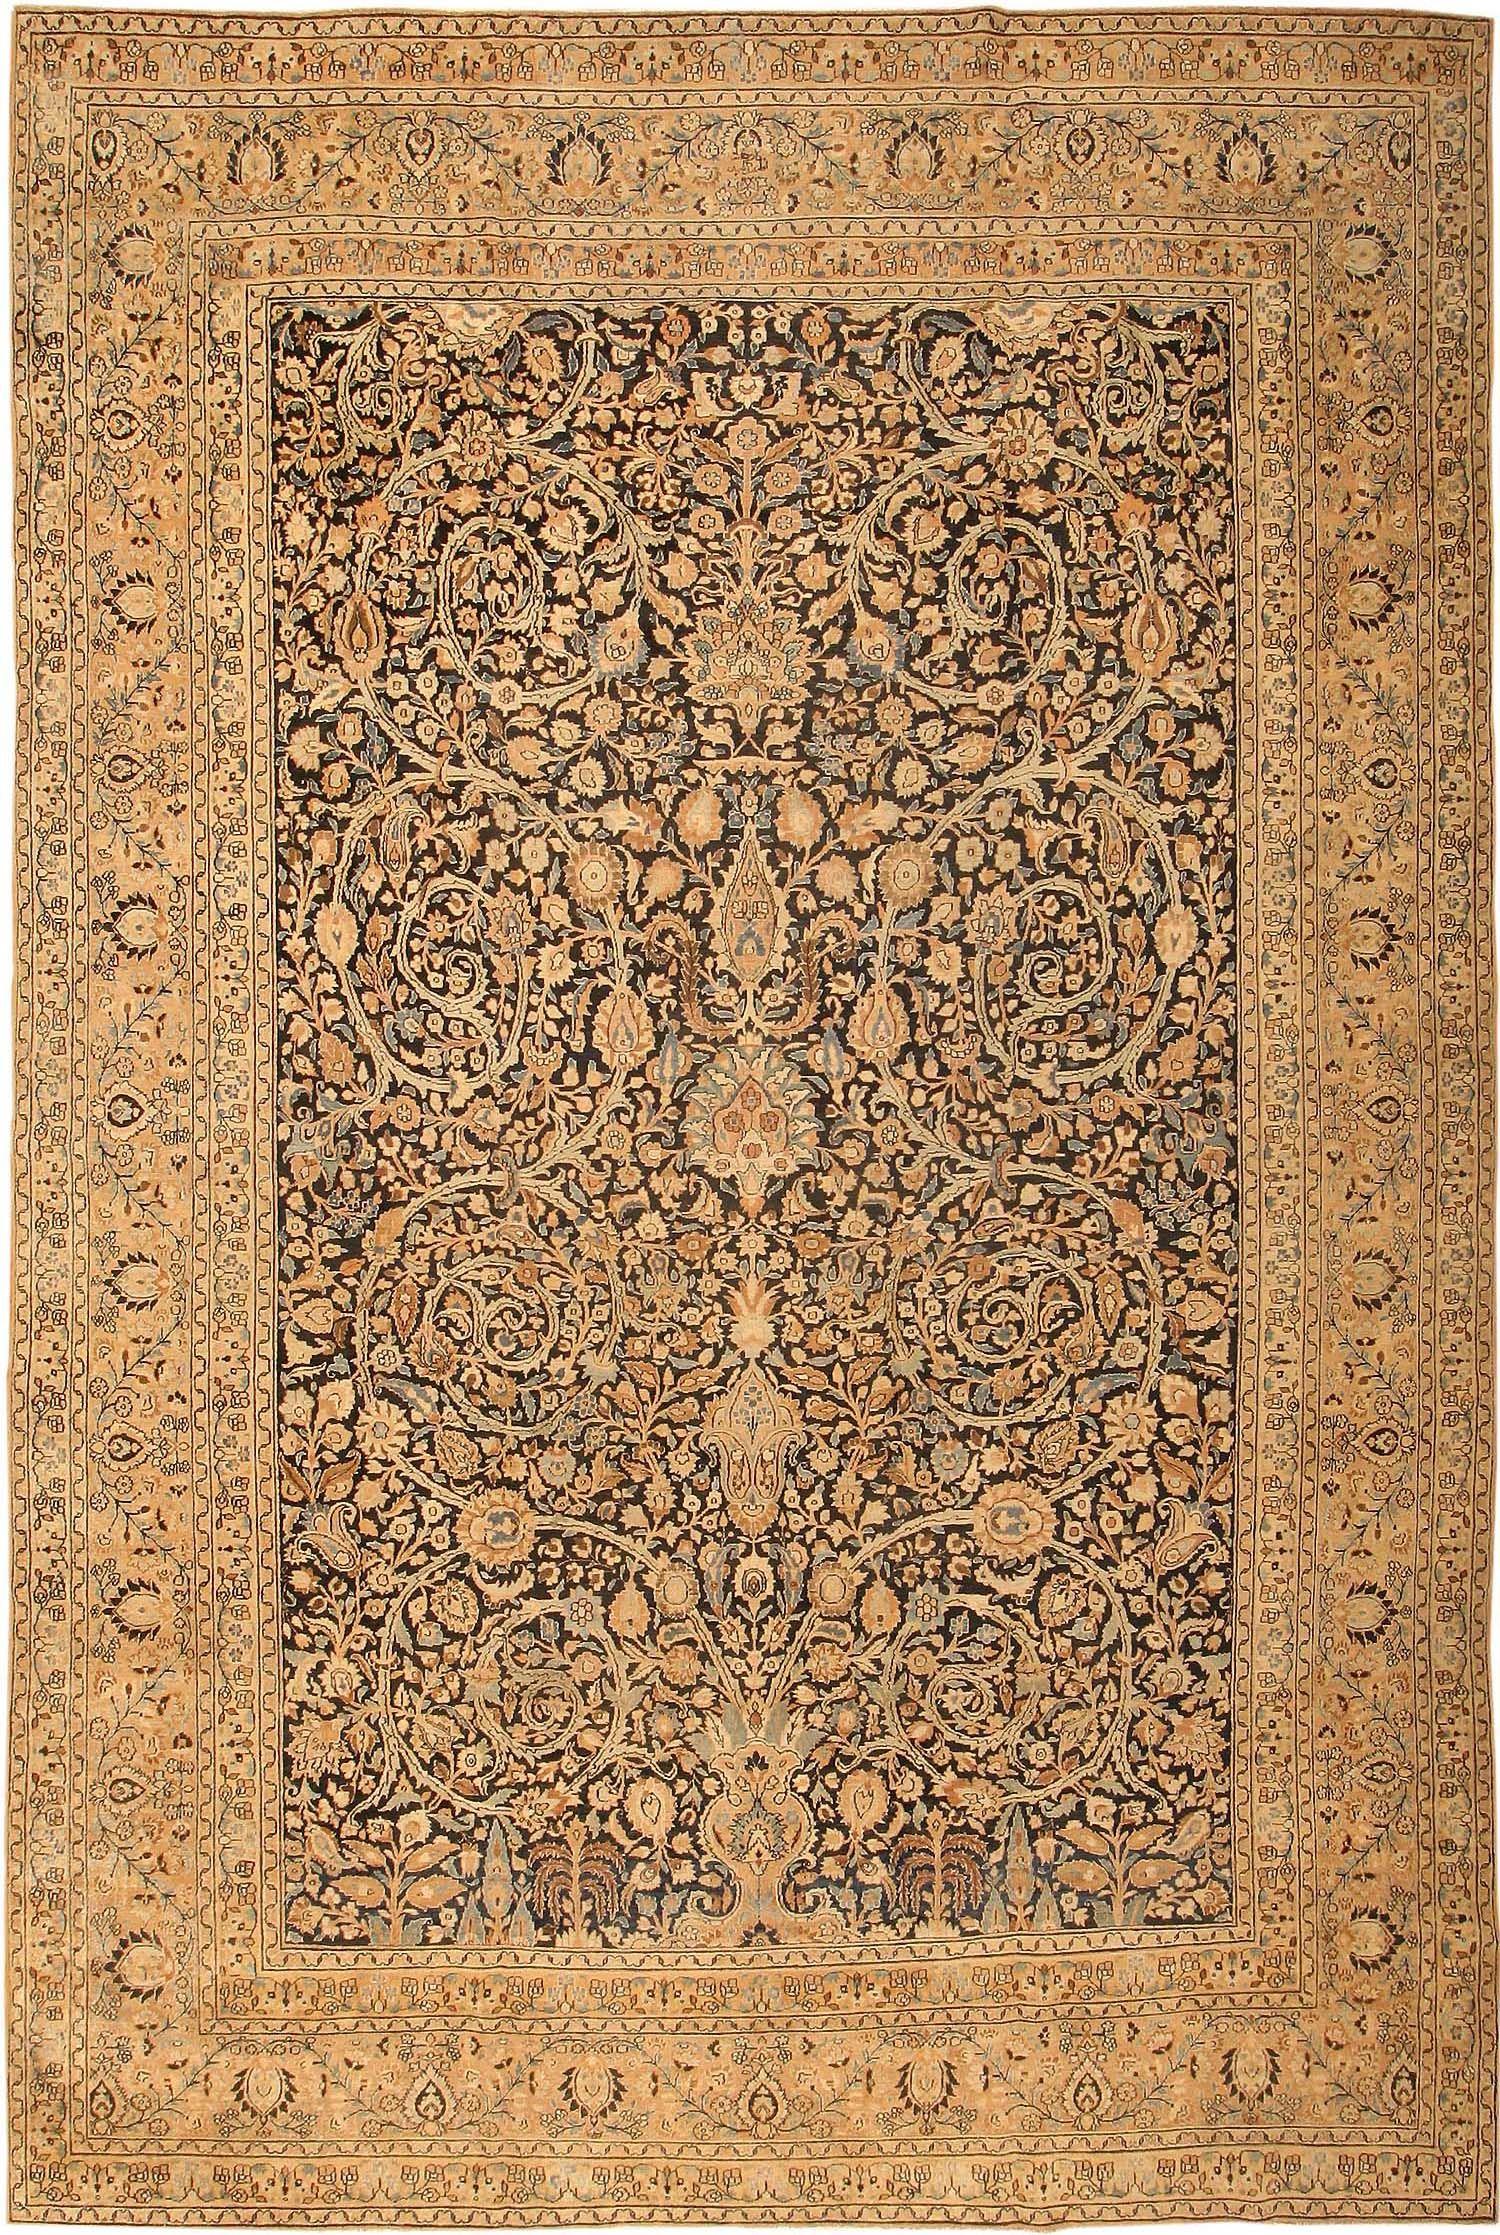 Antique Khorassan Persian Carpets # 41814